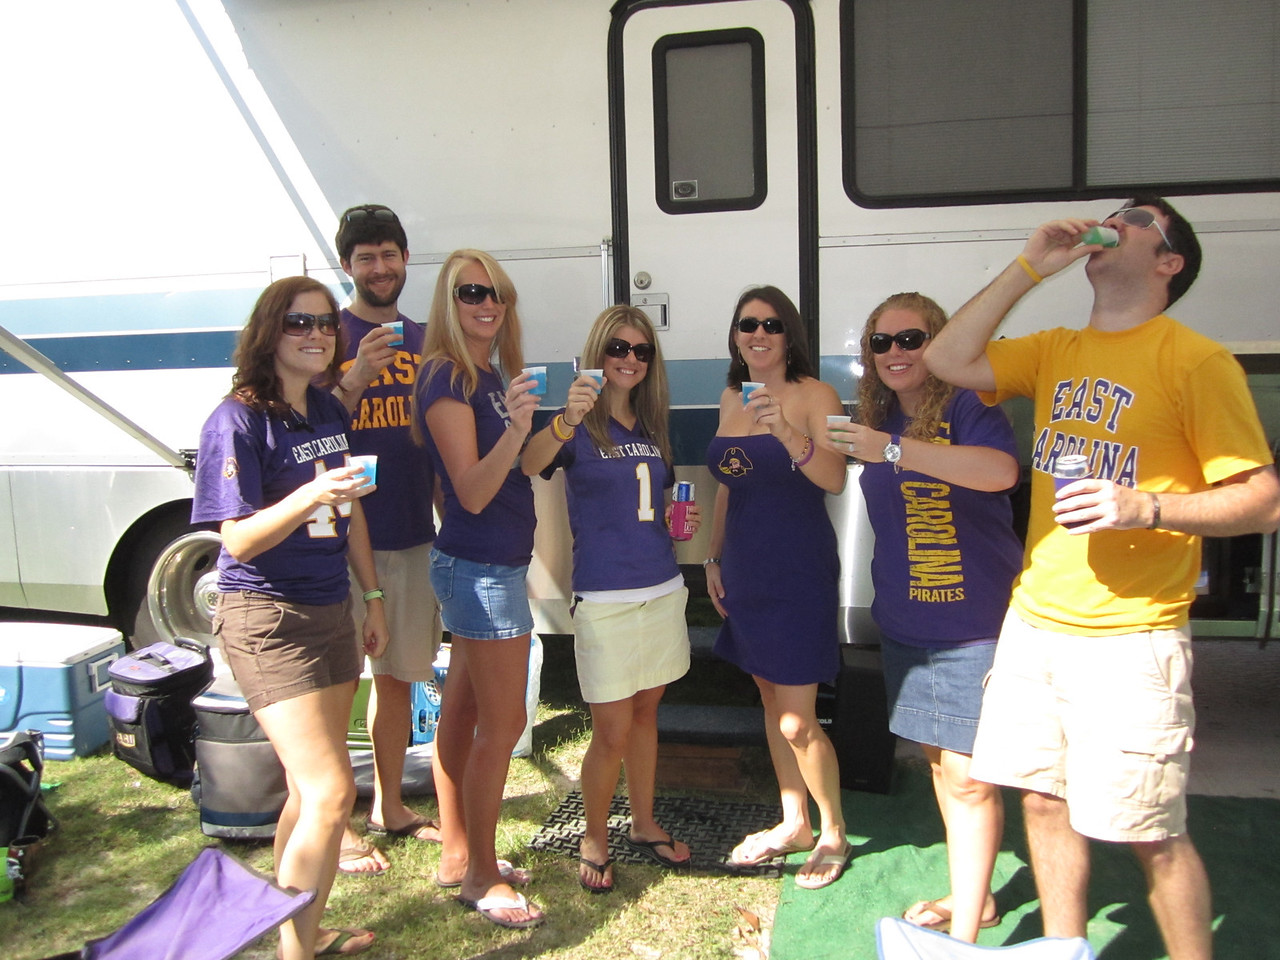 9/10/2011 ECU vs Virginia Tech  Missy, Blane, Staci, Jenn, Emily, Lauren, Preston